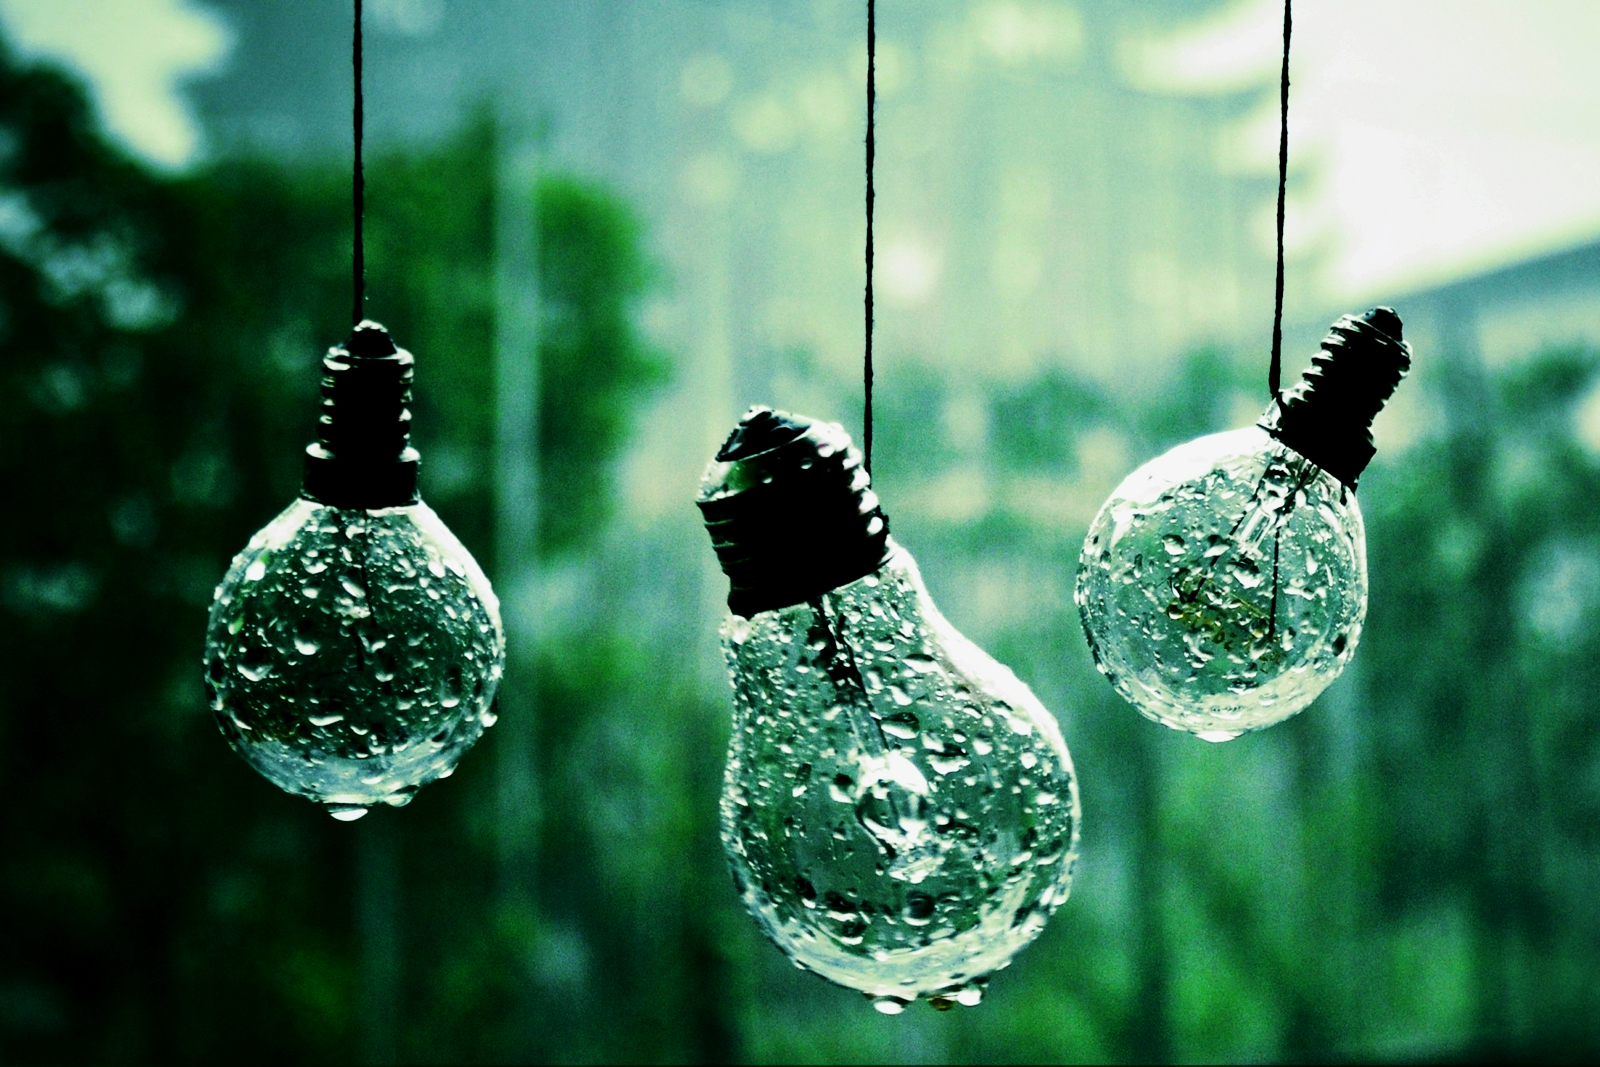 Hd wallpaper rain - Rain Drops Hd Wallpaper Wallpaper Imagebank Biz